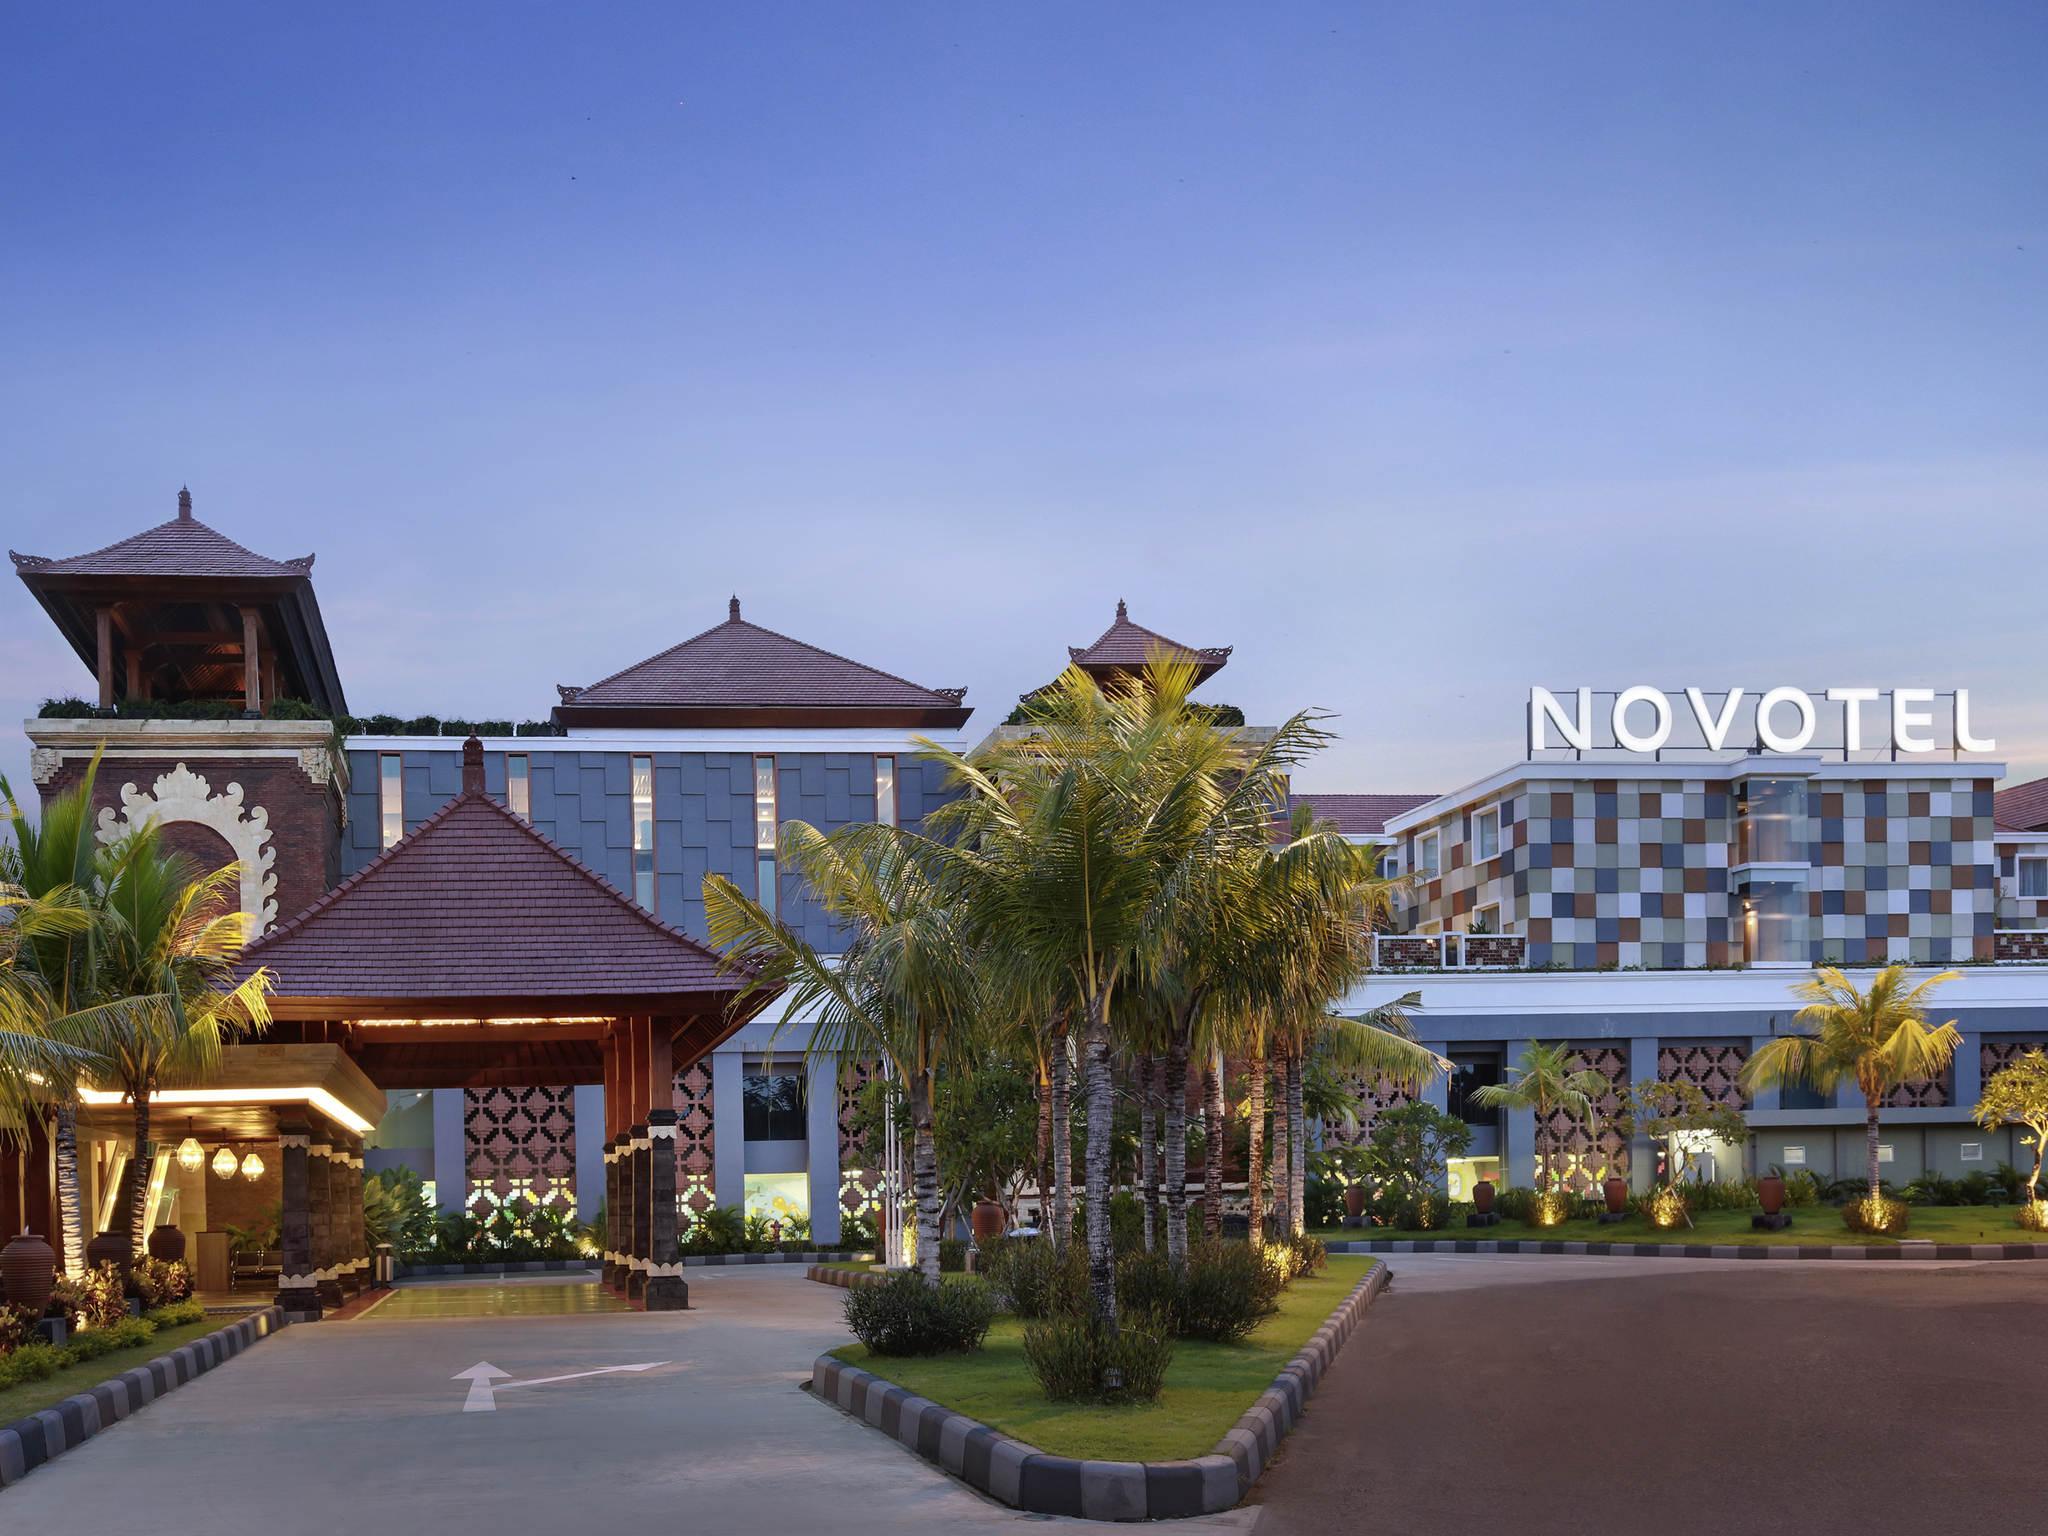 Hotel – Novotel Bali Ngurah Rai Airport